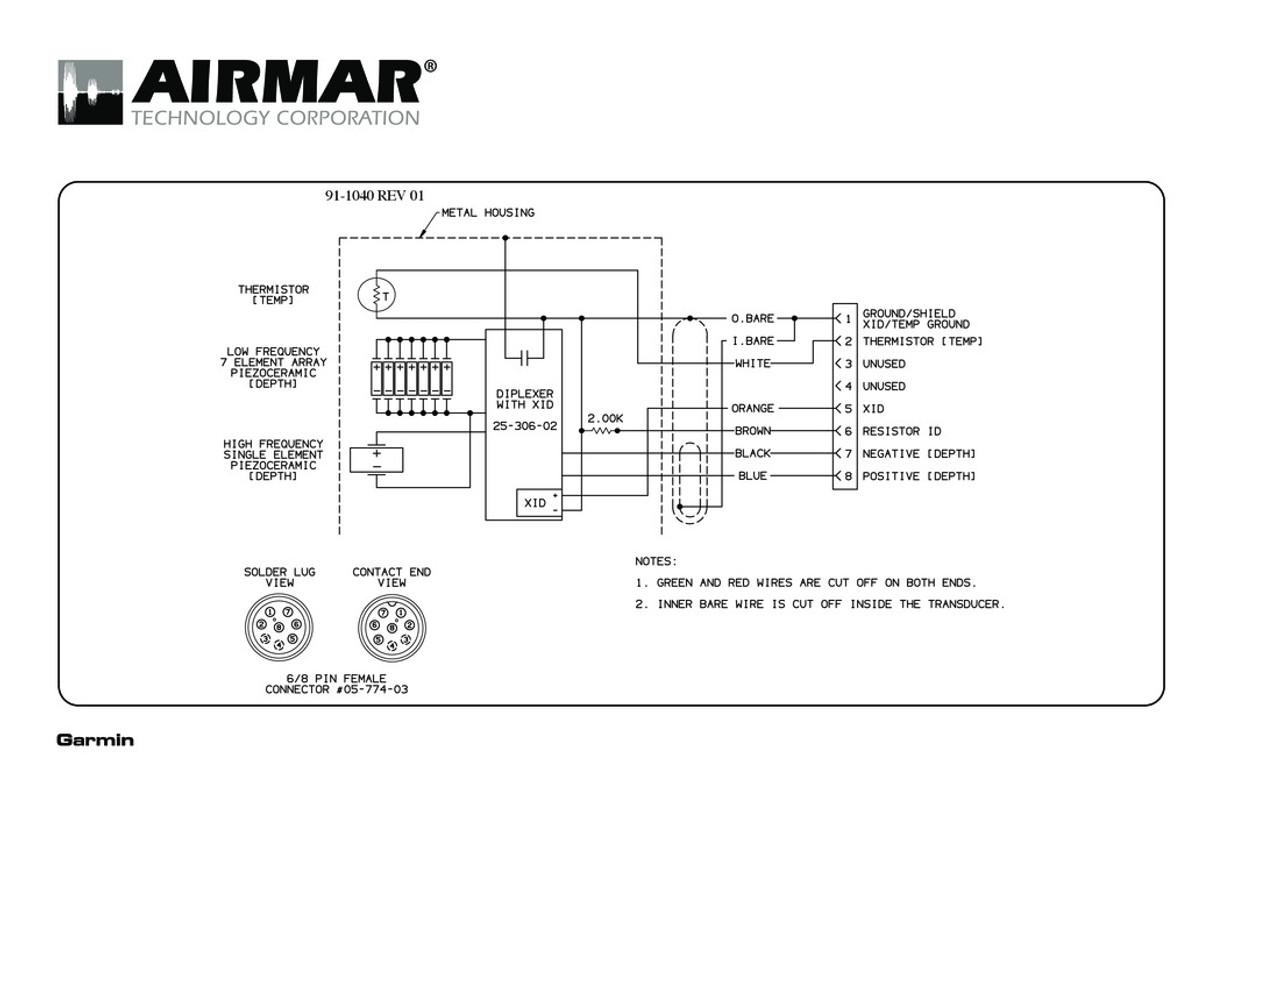 medium resolution of airmar wiring diagram garmin 1kw 8 pin d t blue bottle marinedepth